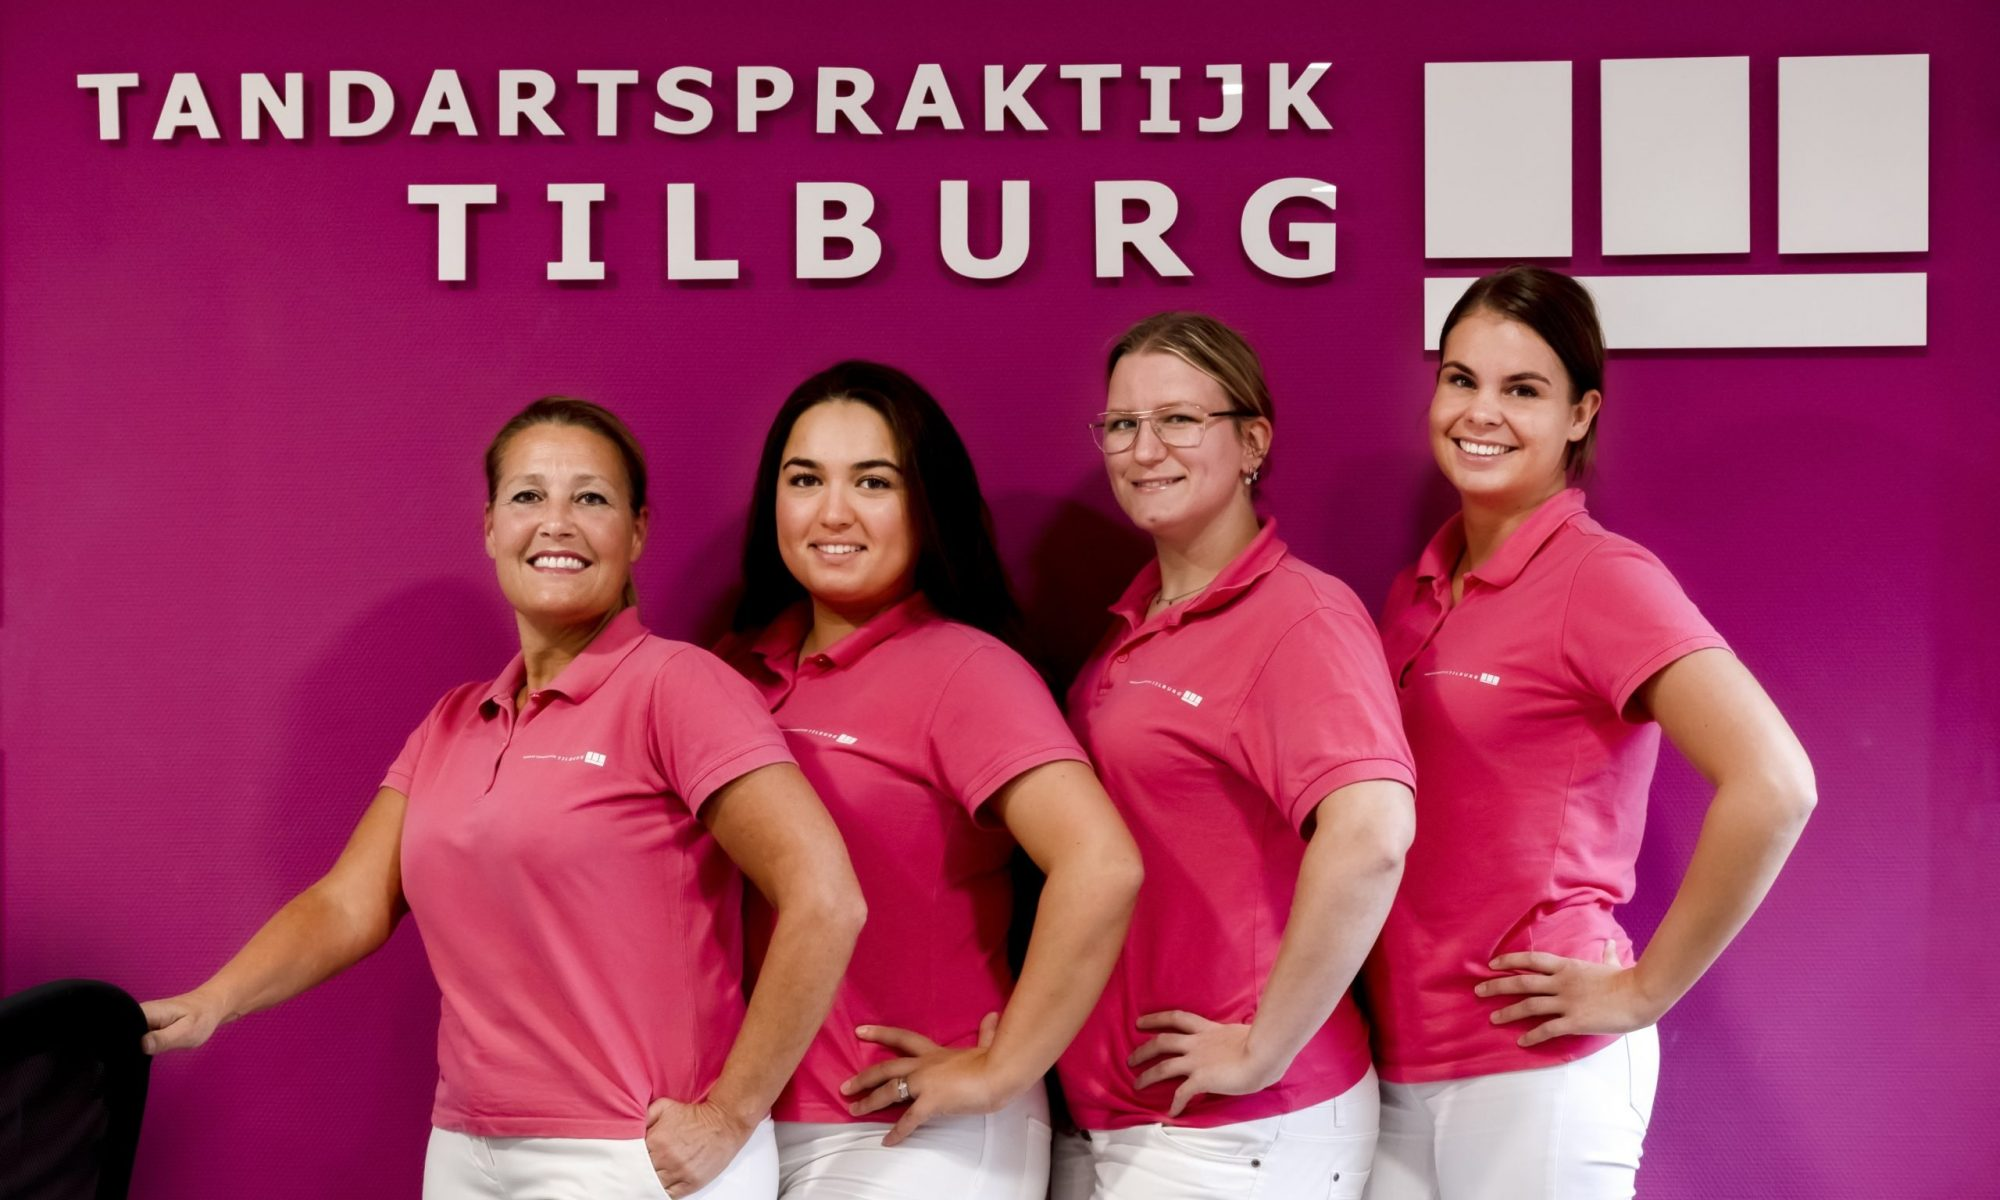 Tandartspraktijk Tilburg | Reeshof